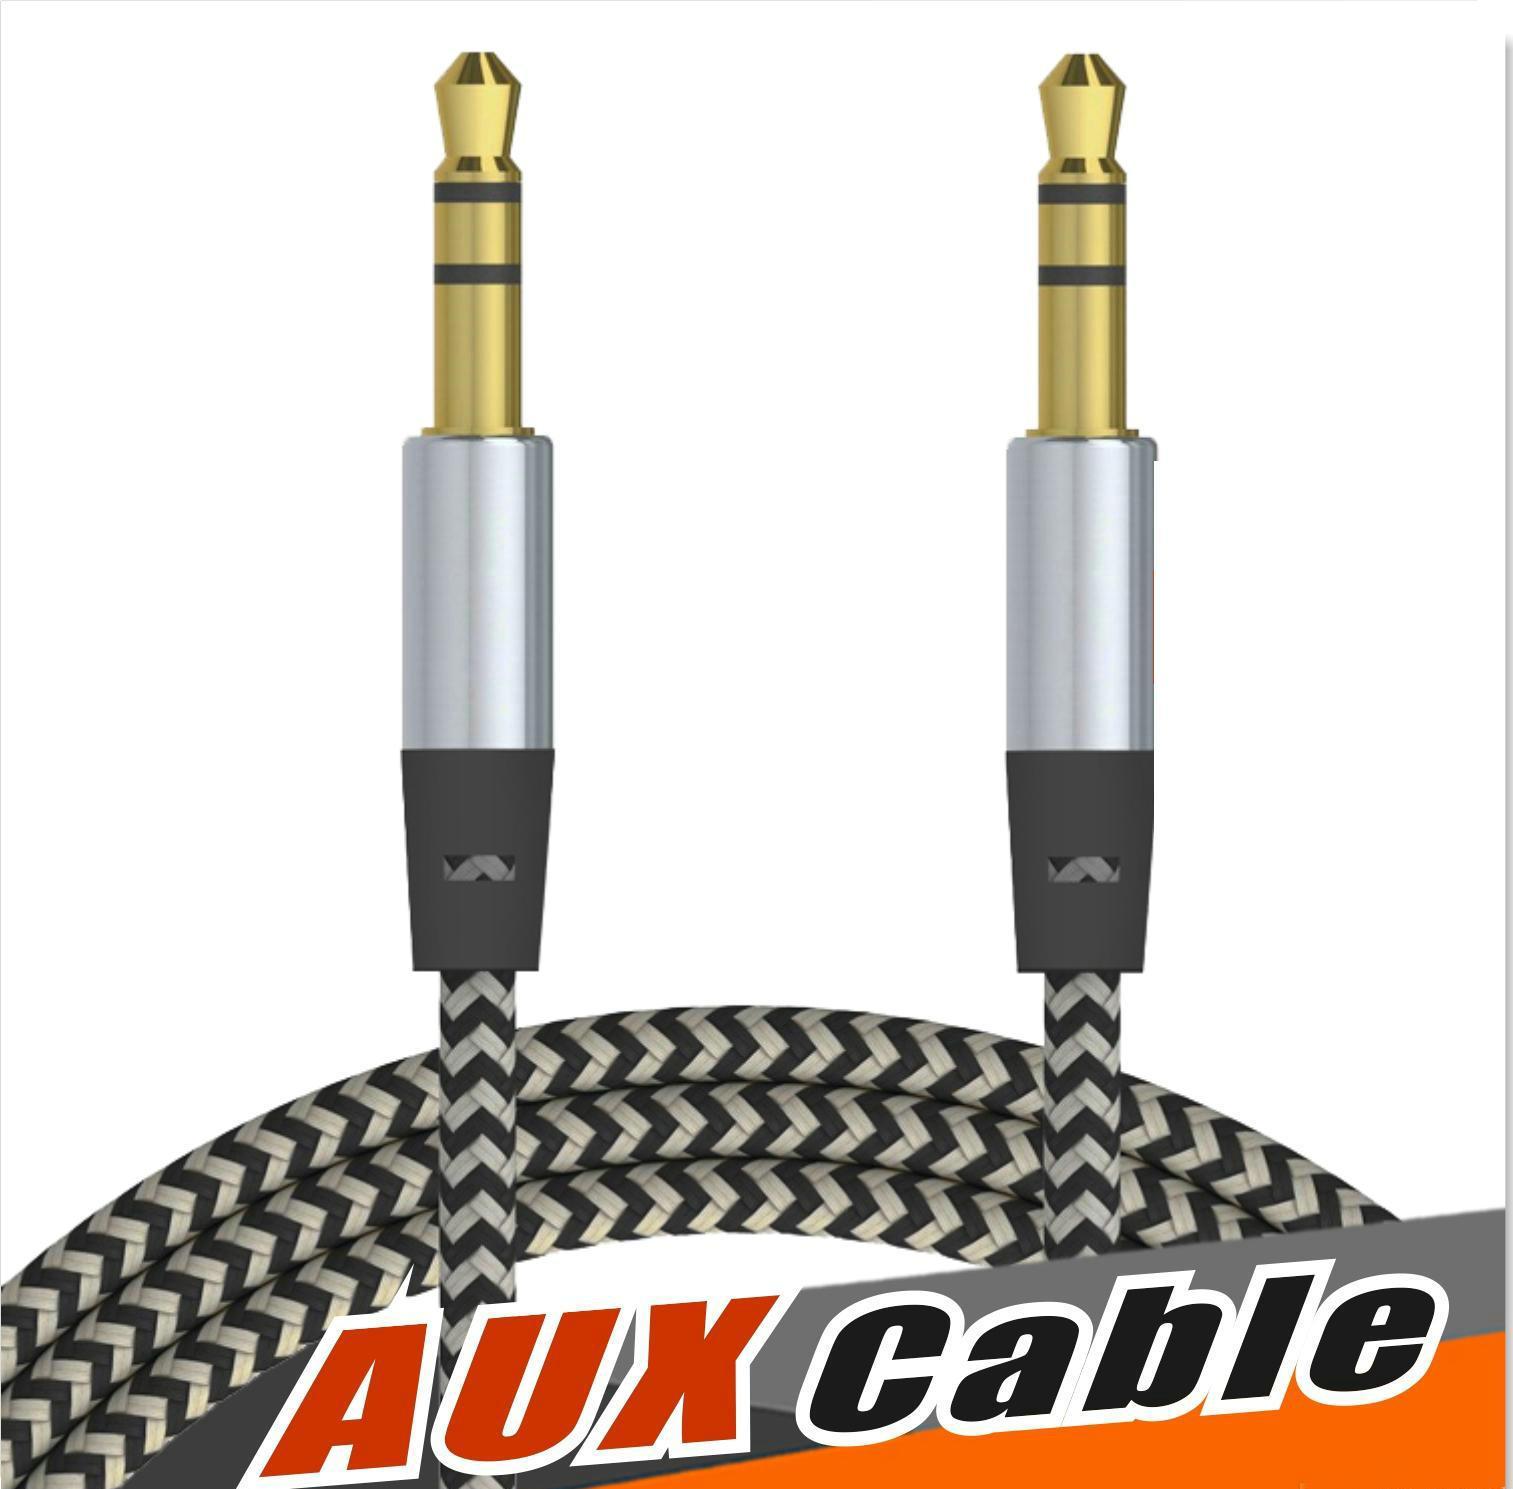 Aux Braid Audiopケーブル3.5mmの男性の男性のステレオのオーディオコードワイヤー1M 3FTケーブルのための3フィートのケーブルはサムスンLG HTCの携帯電話MP3プレーヤーOM-I5